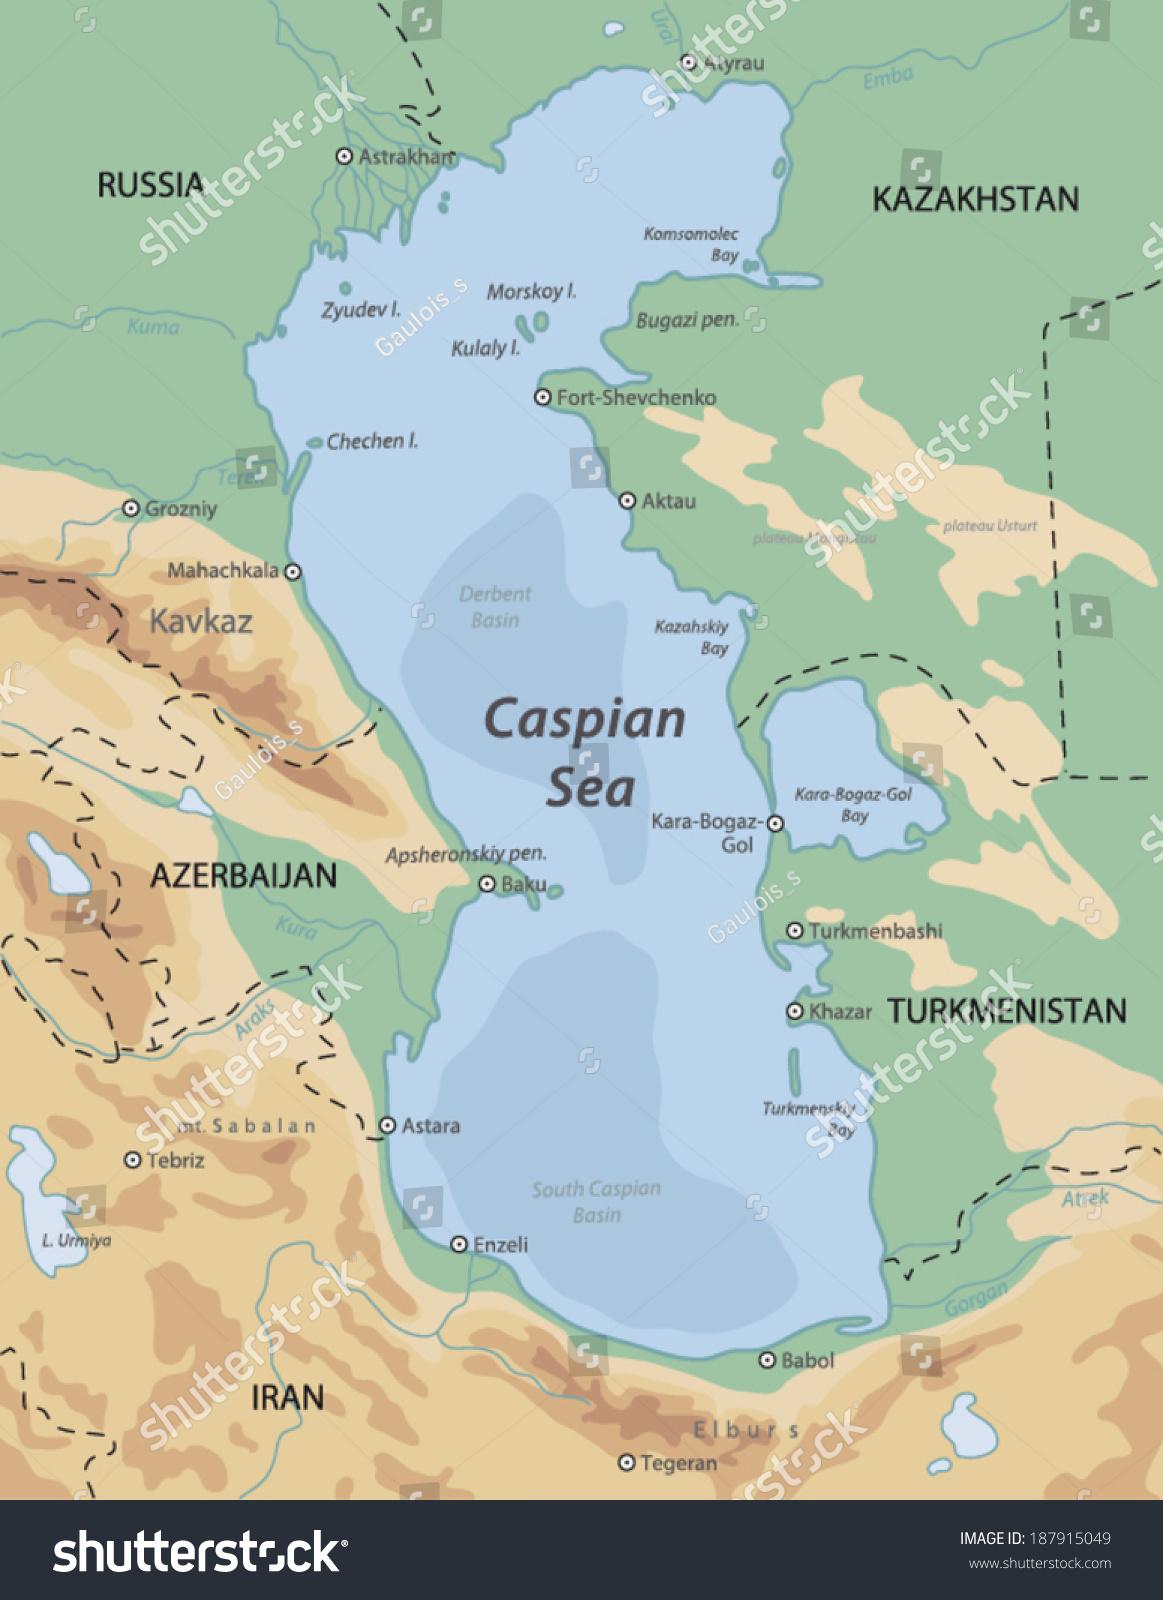 Caspian Sea Map Stock Vector Shutterstock - Caspian sea world map